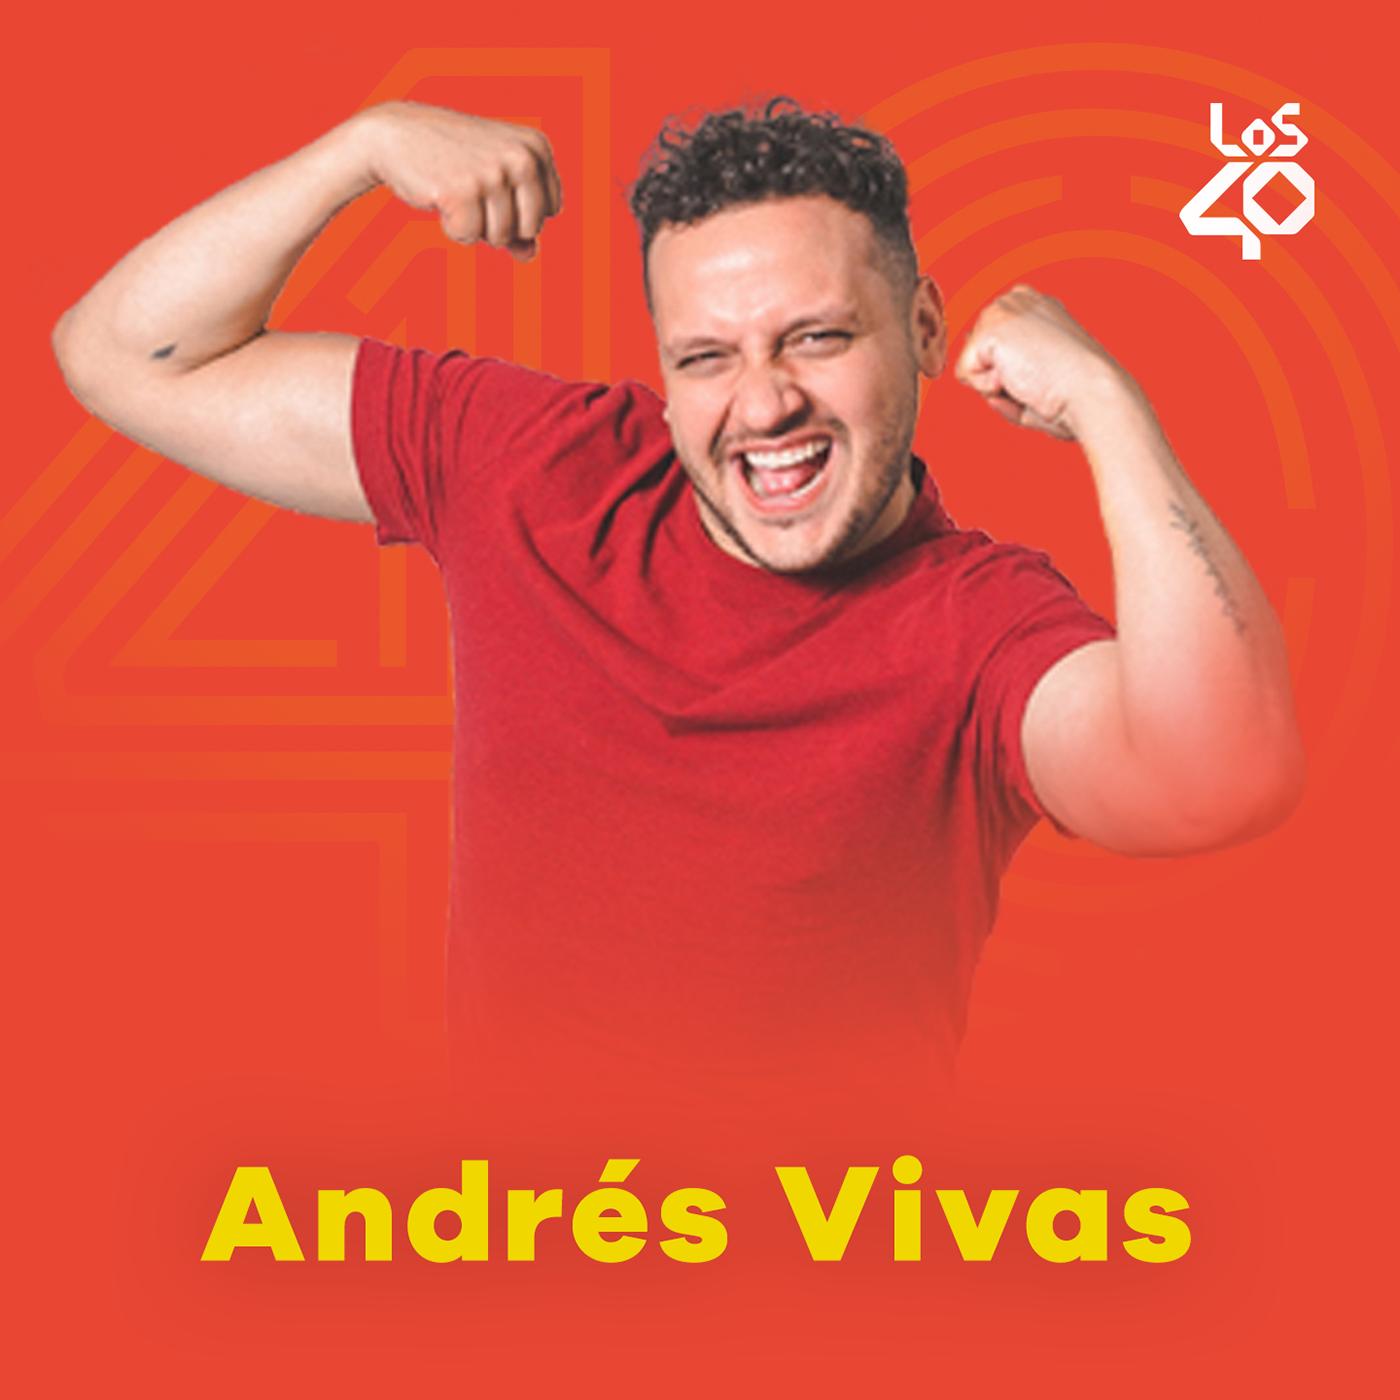 Imagen José Andrés Vivas